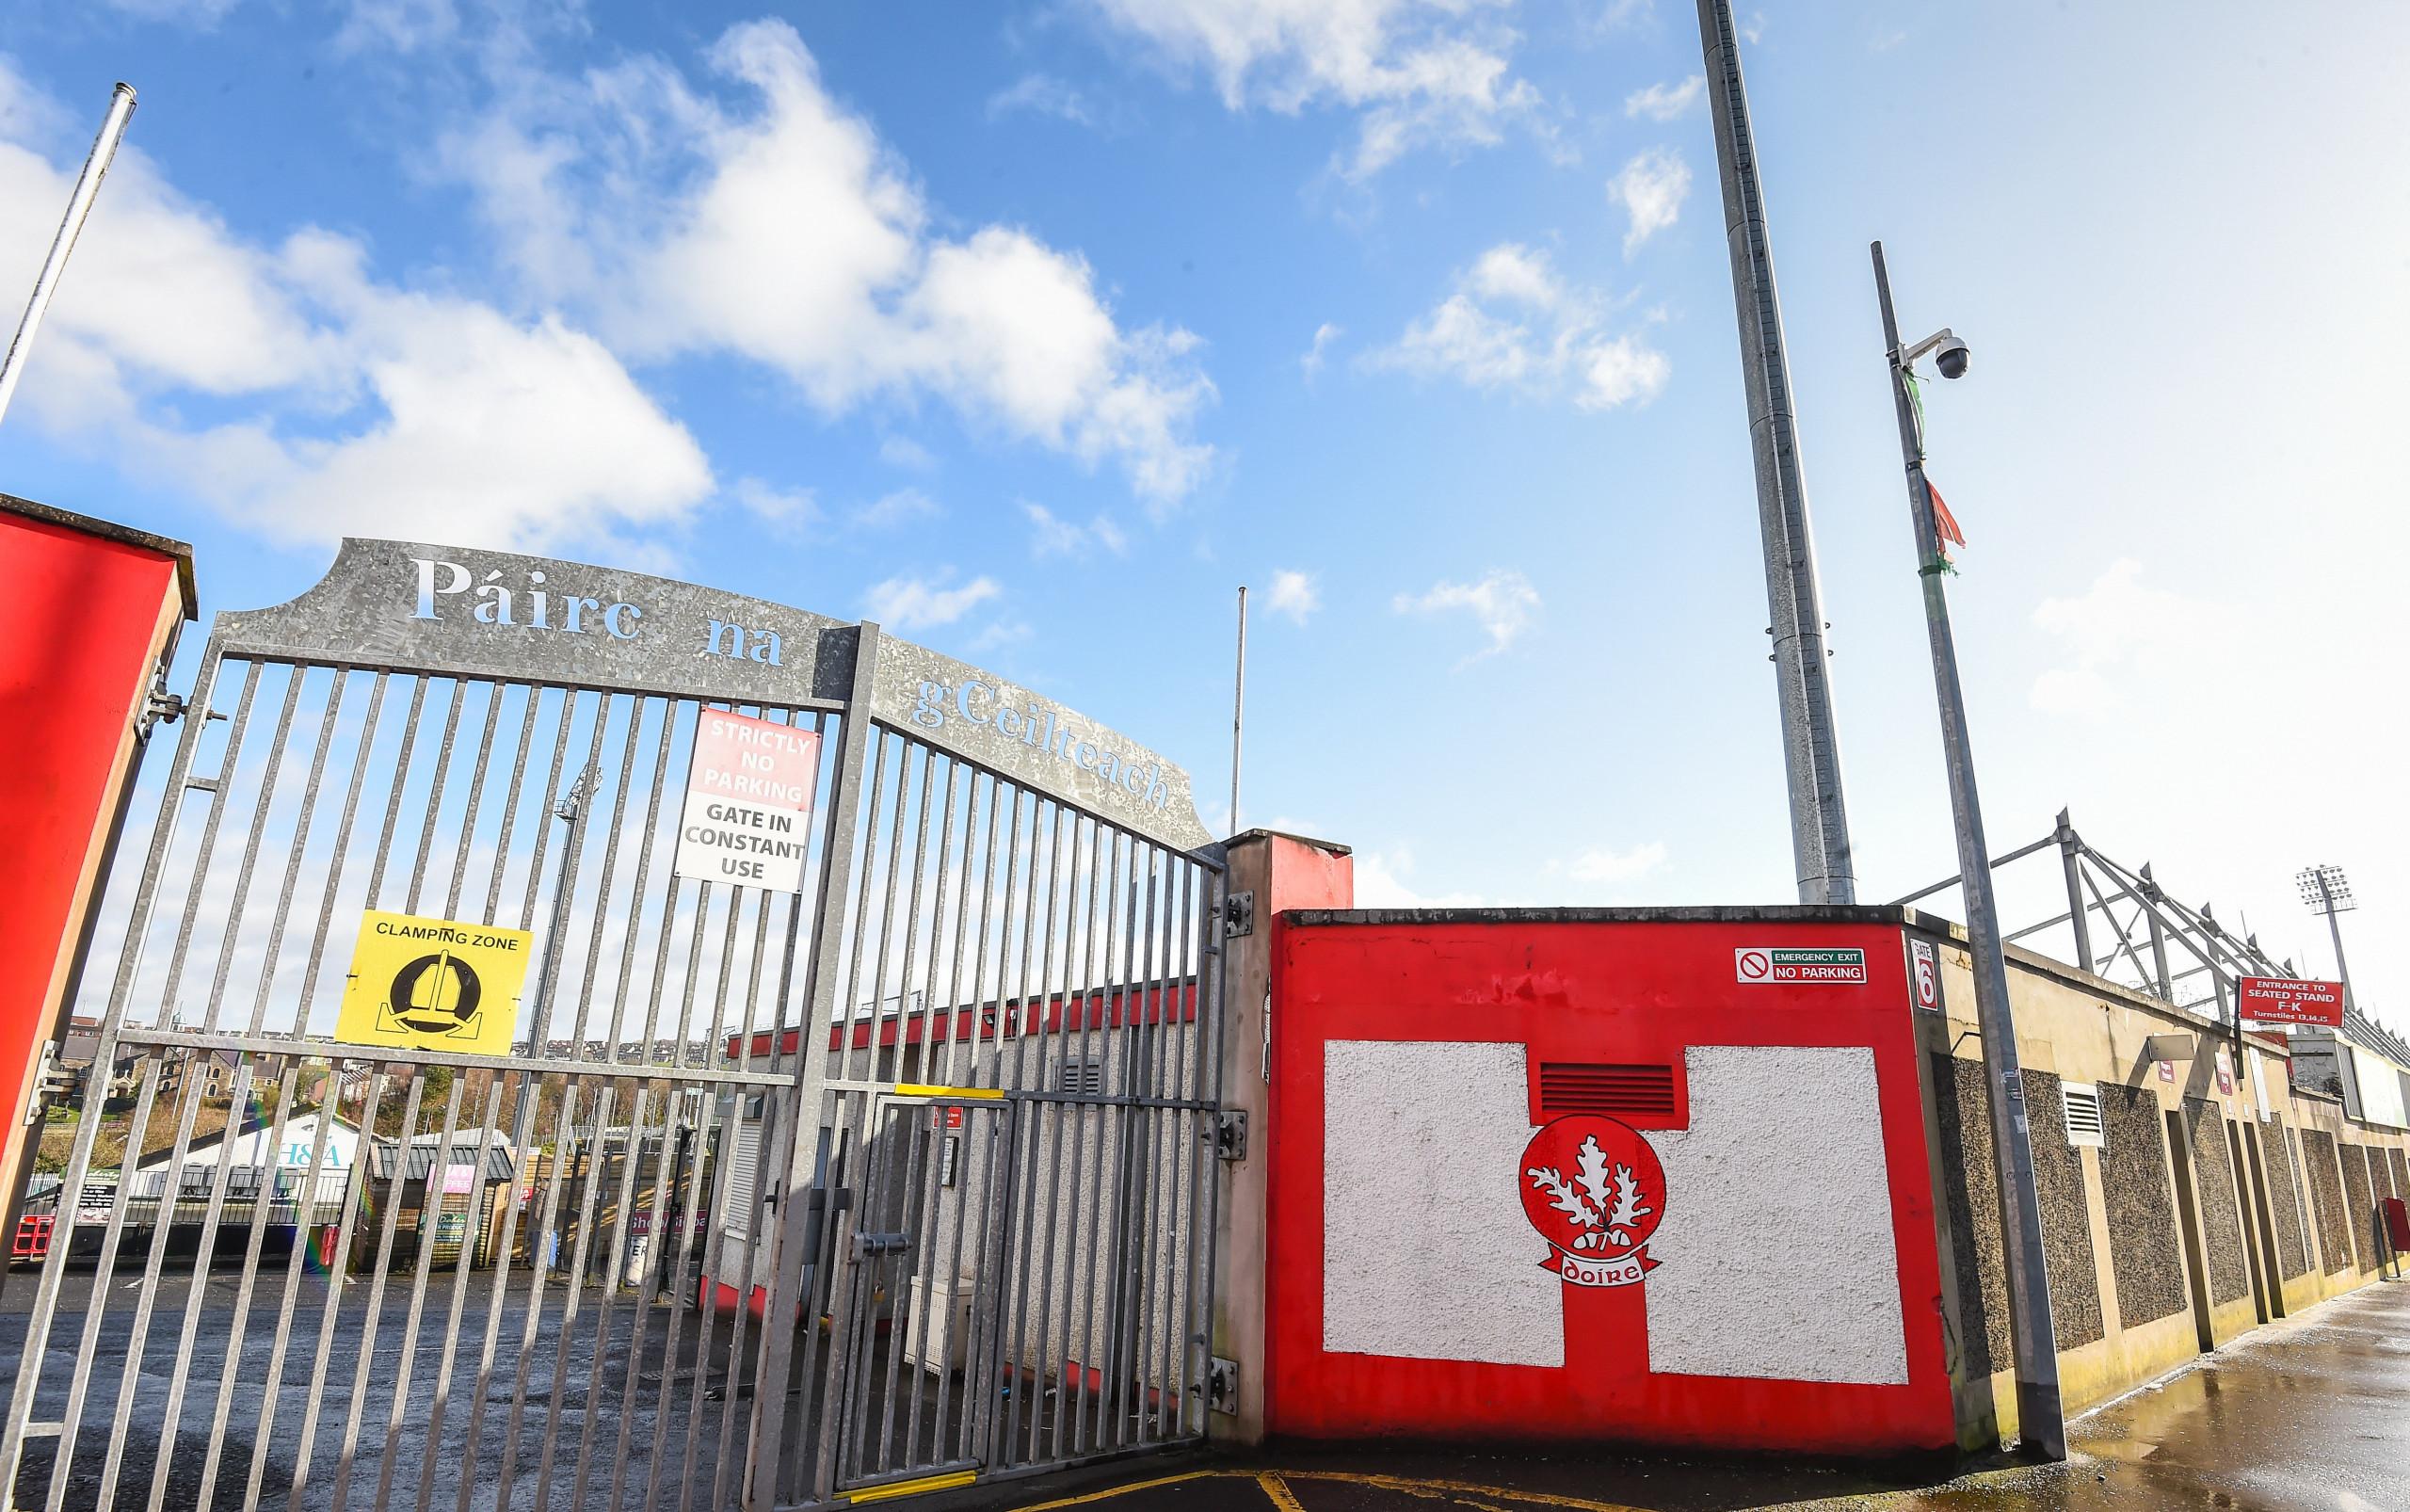 Ulster SFC Quarter Final Preview: Derry v Armagh